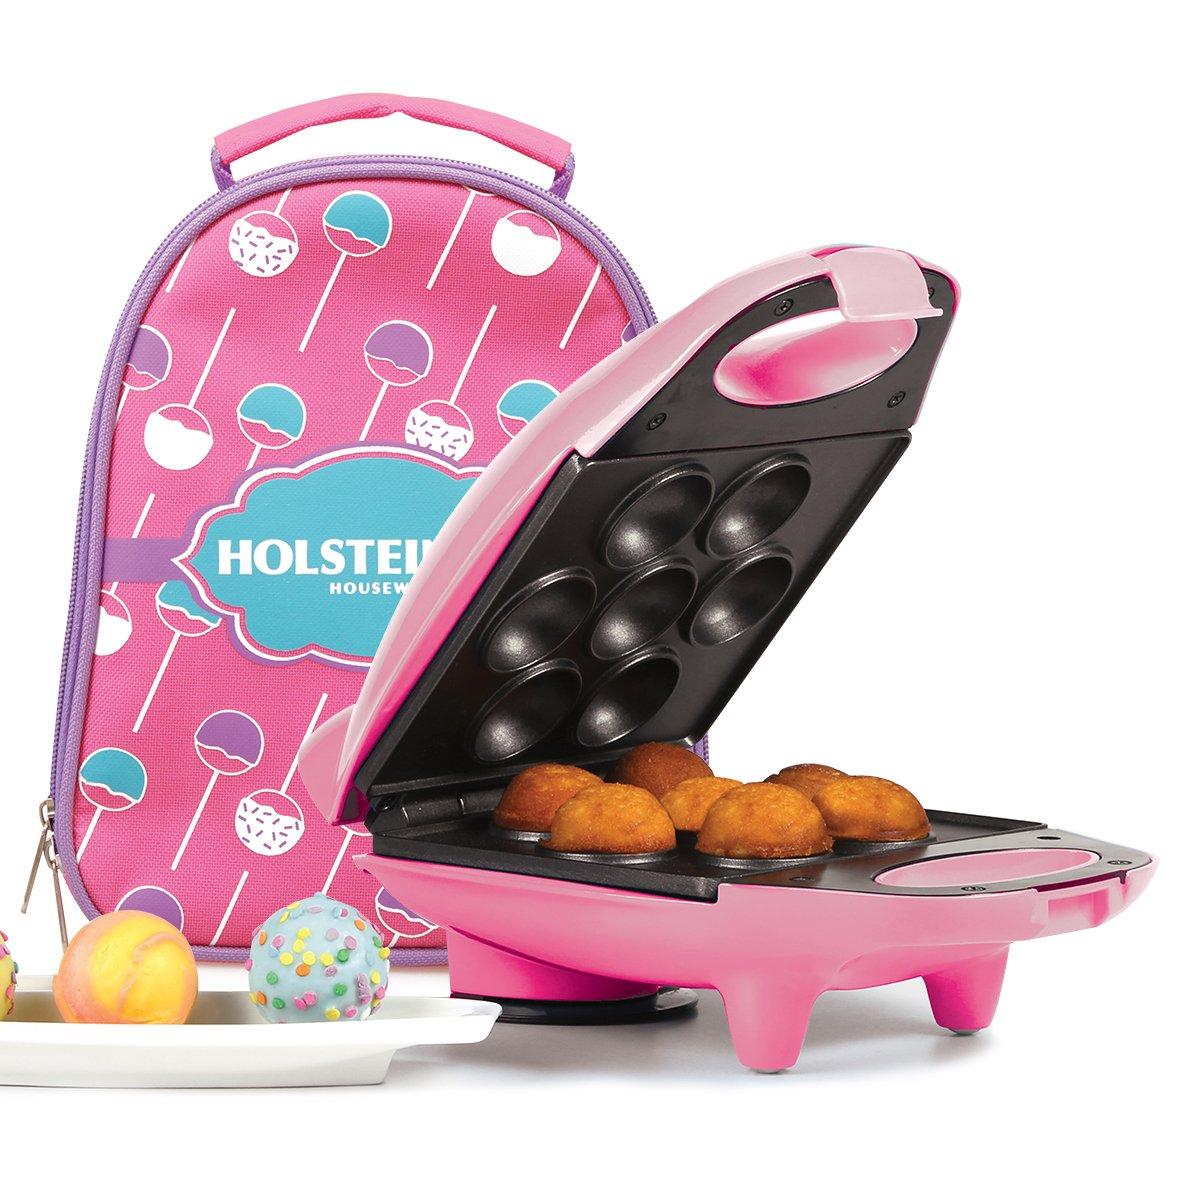 Holstein Housewares HM-09104V-BU Mini Cake Pop Maker Kit - Pink